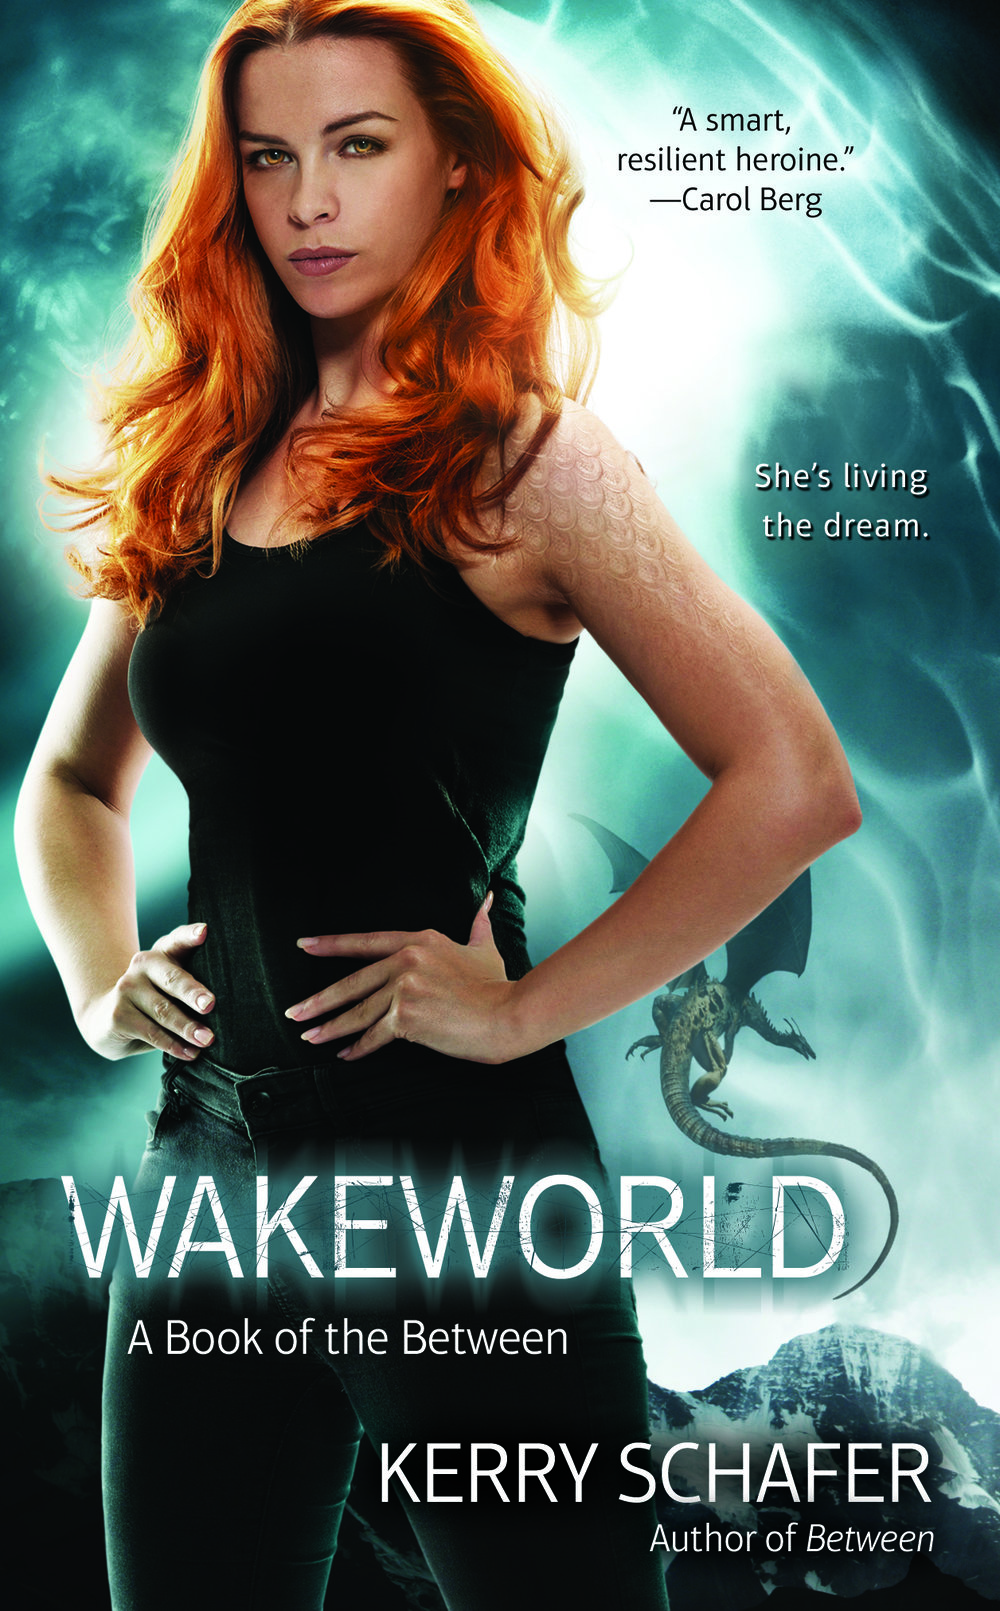 Wakeworld, Book 2 of the Between